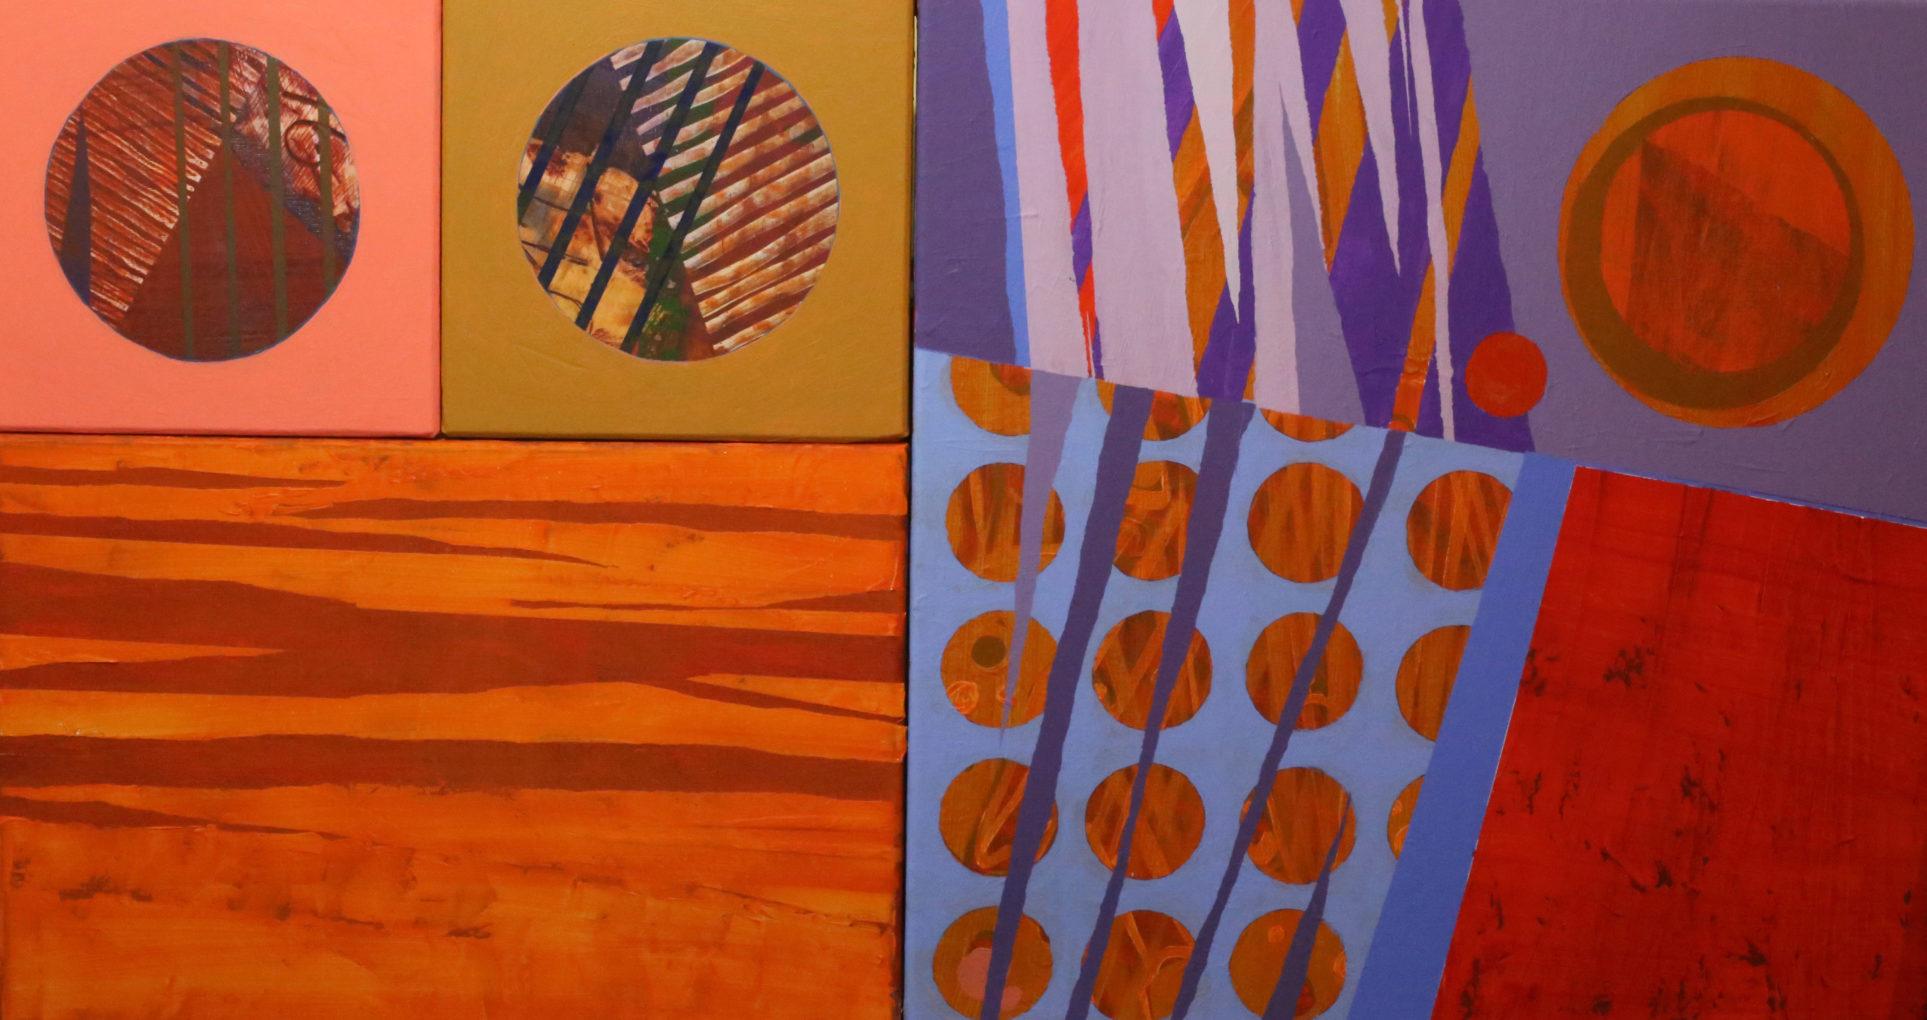 Aleksandra Jadczuk, Daydreamig, 2019, akryl na płótnie,,70x130cm